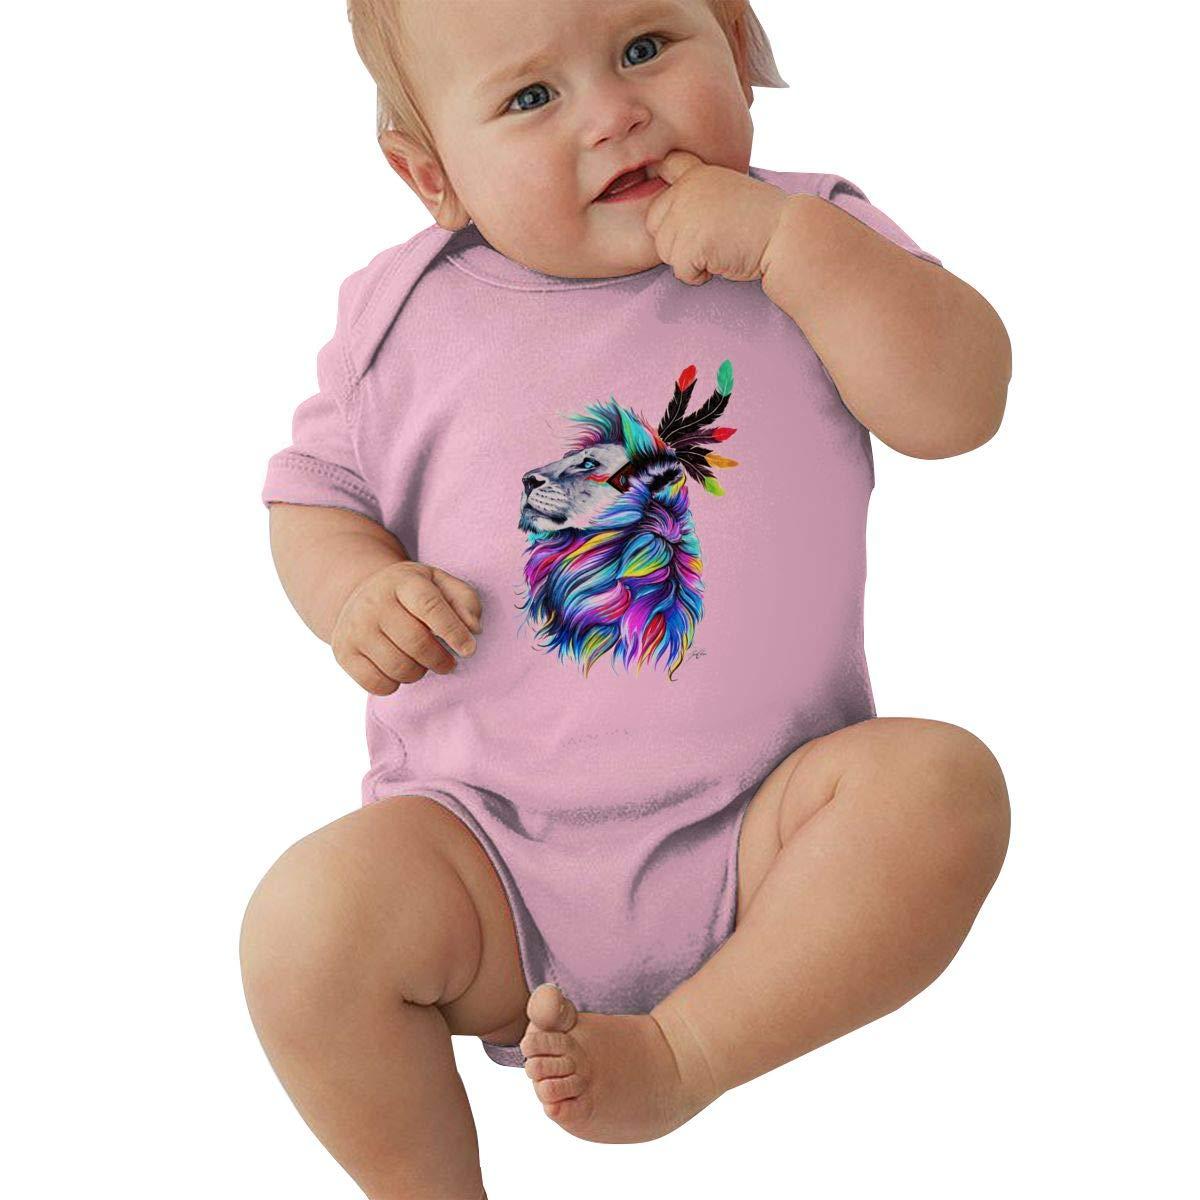 Dfenere Multicolored Lion Graphic Newborn Baby Short Sleeve Bodysuit Romper Infant Summer Clothing Black